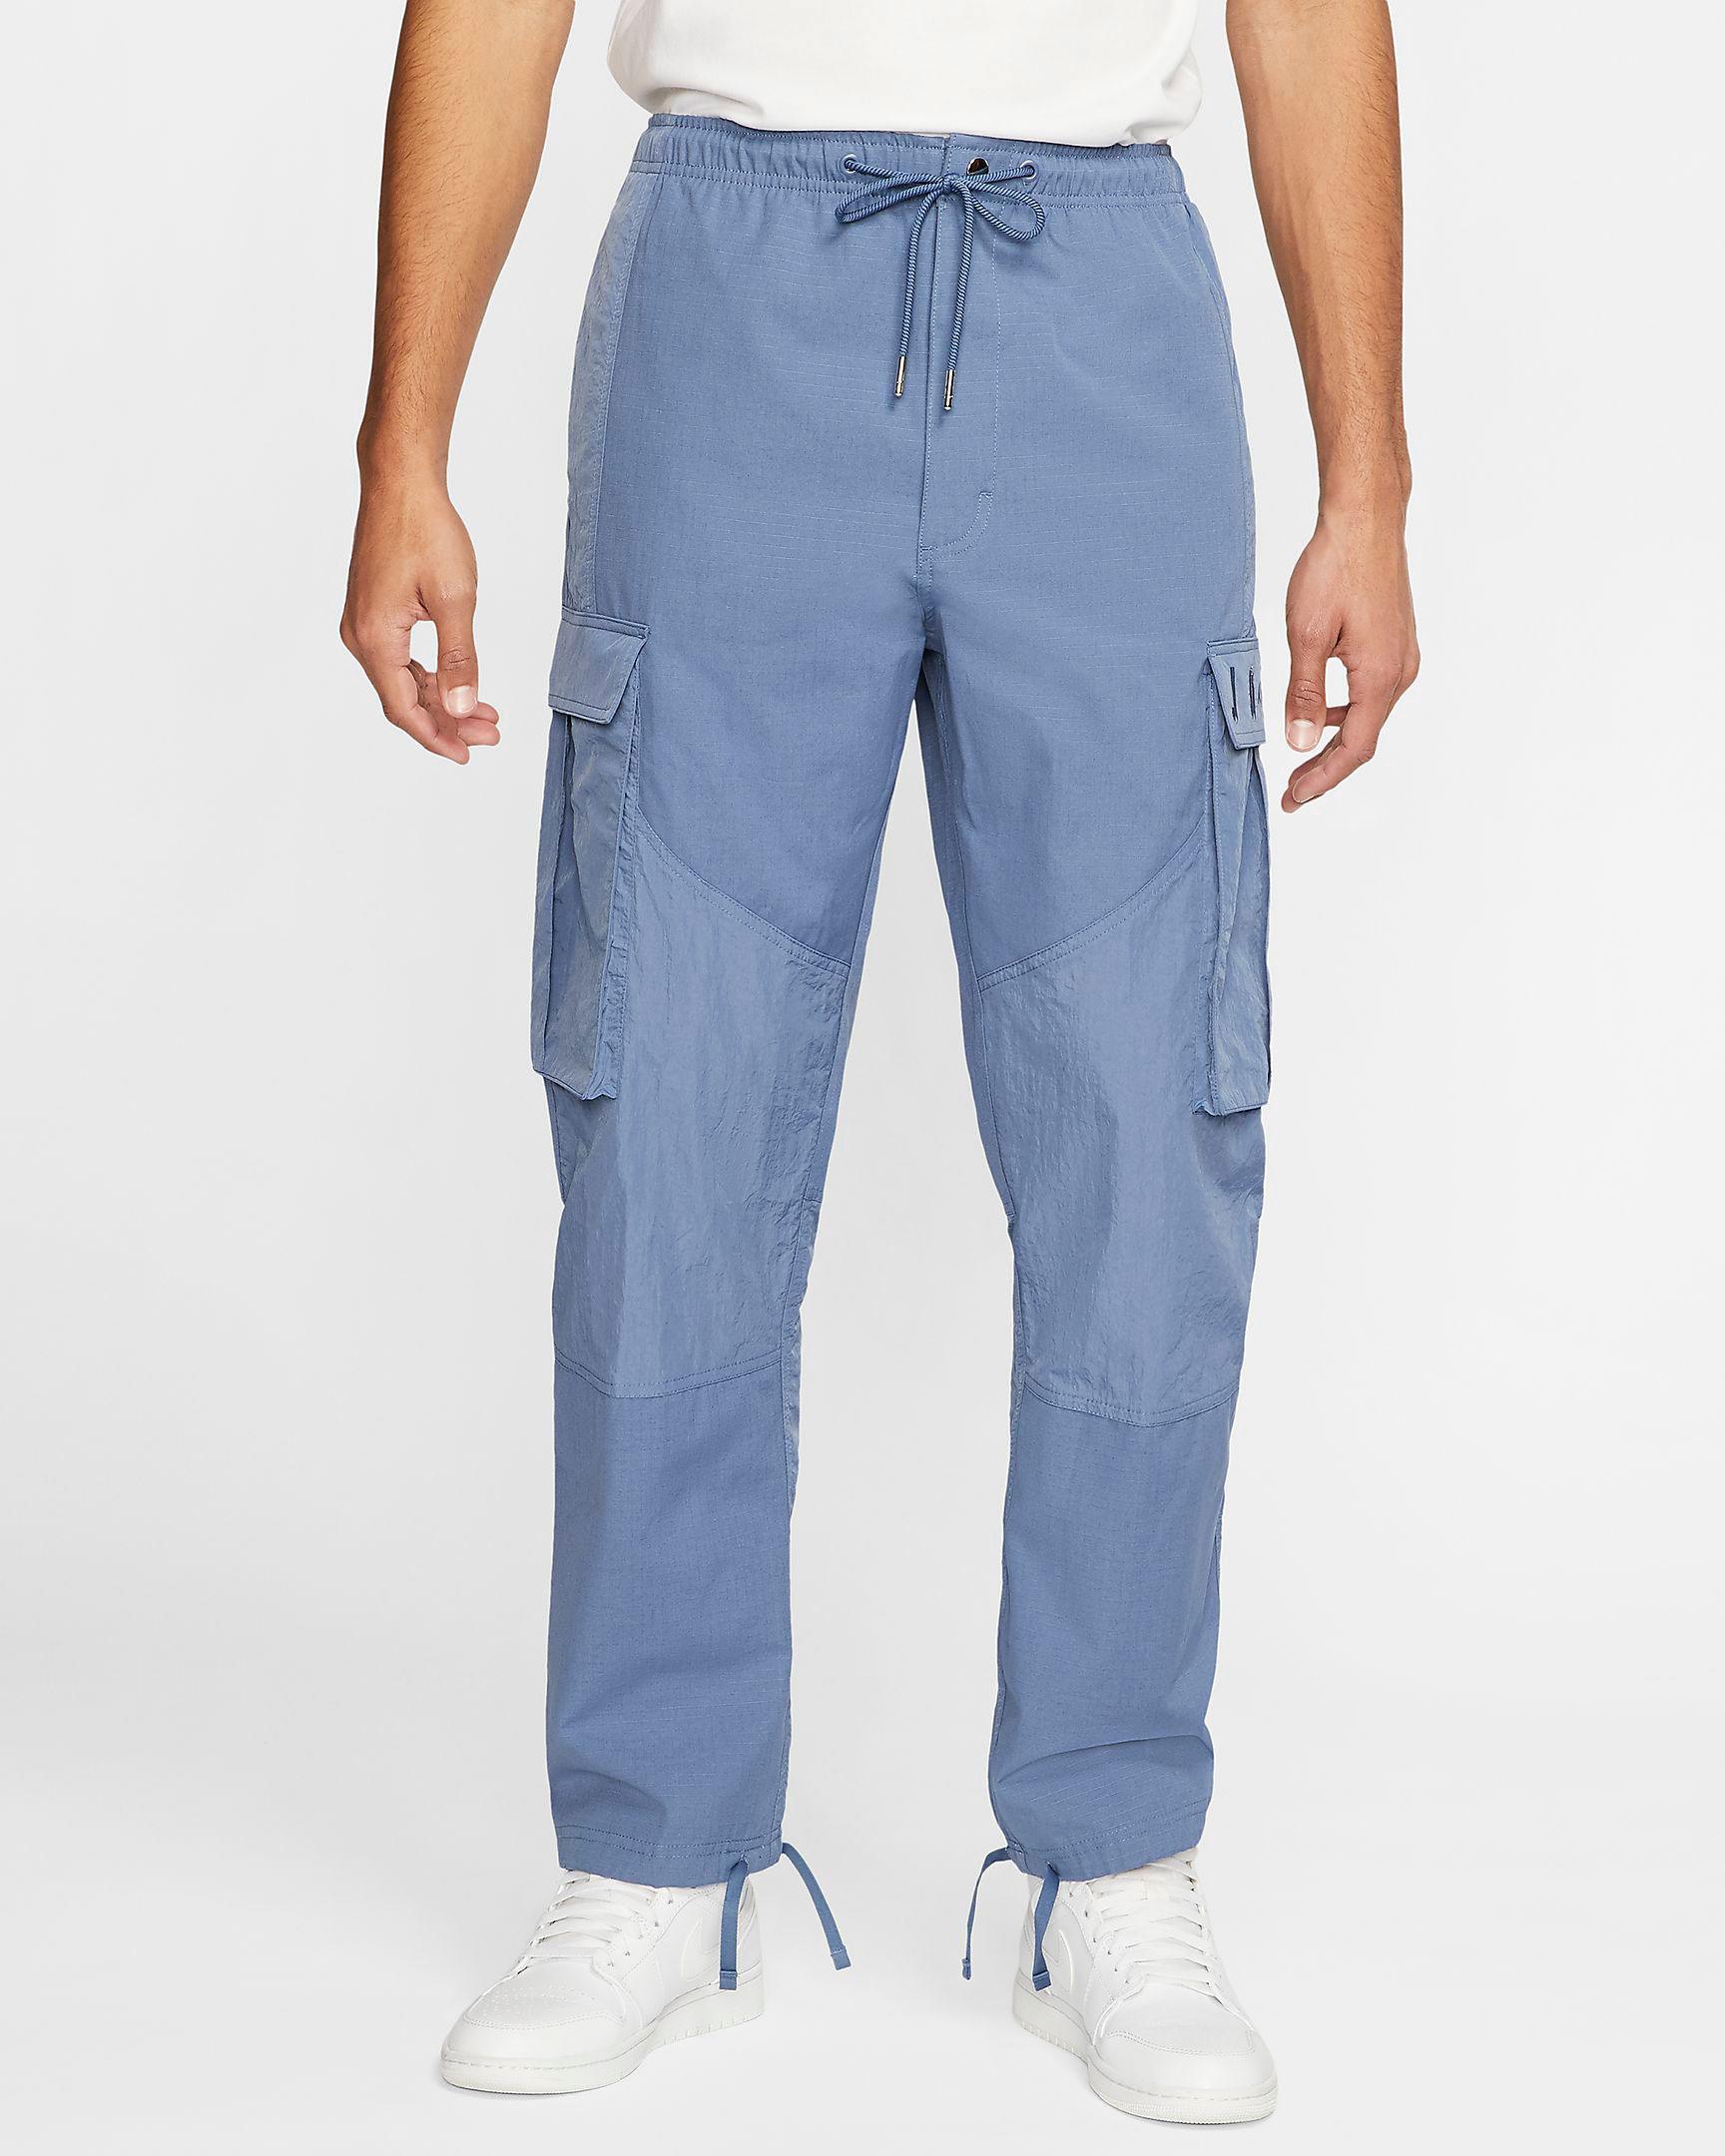 jordan-sport-dna-cargo-pants-navy-blue-1